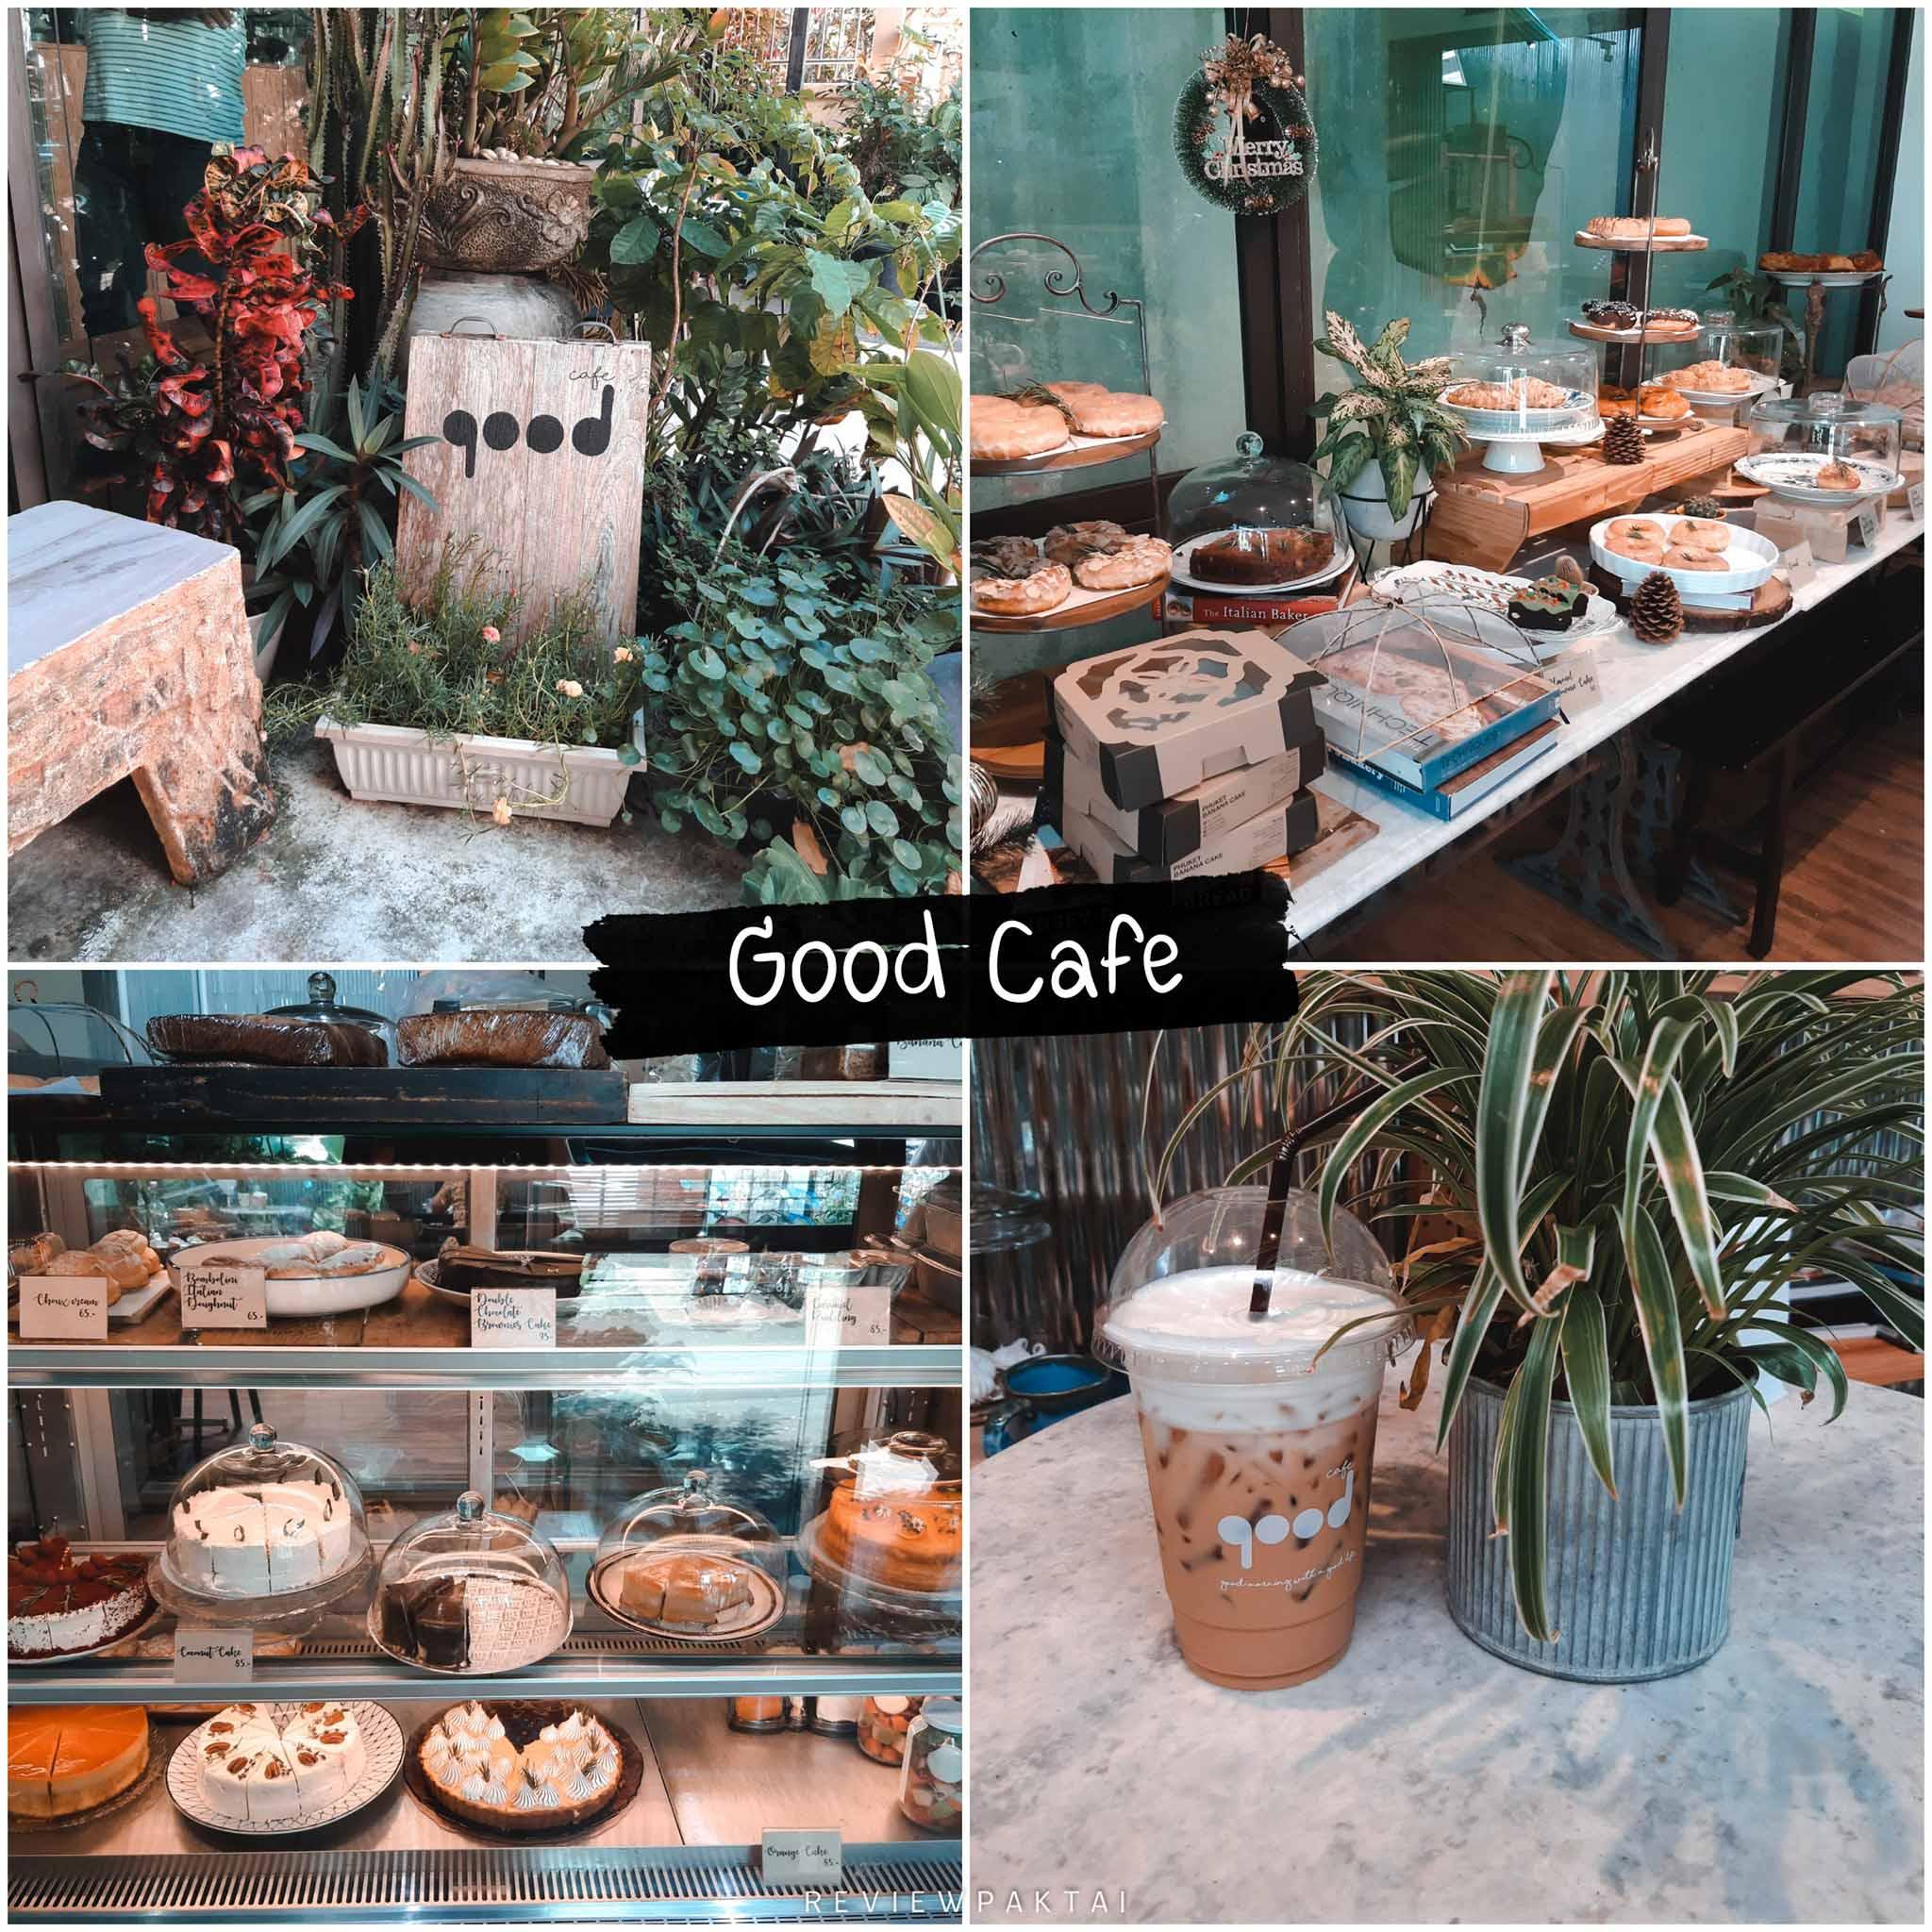 Good-Cafe ภูเก็ต,คาเฟ่,ที่เที่ยว,ร้านกาแฟ,เด็ด,อร่อย,ต้องลอง